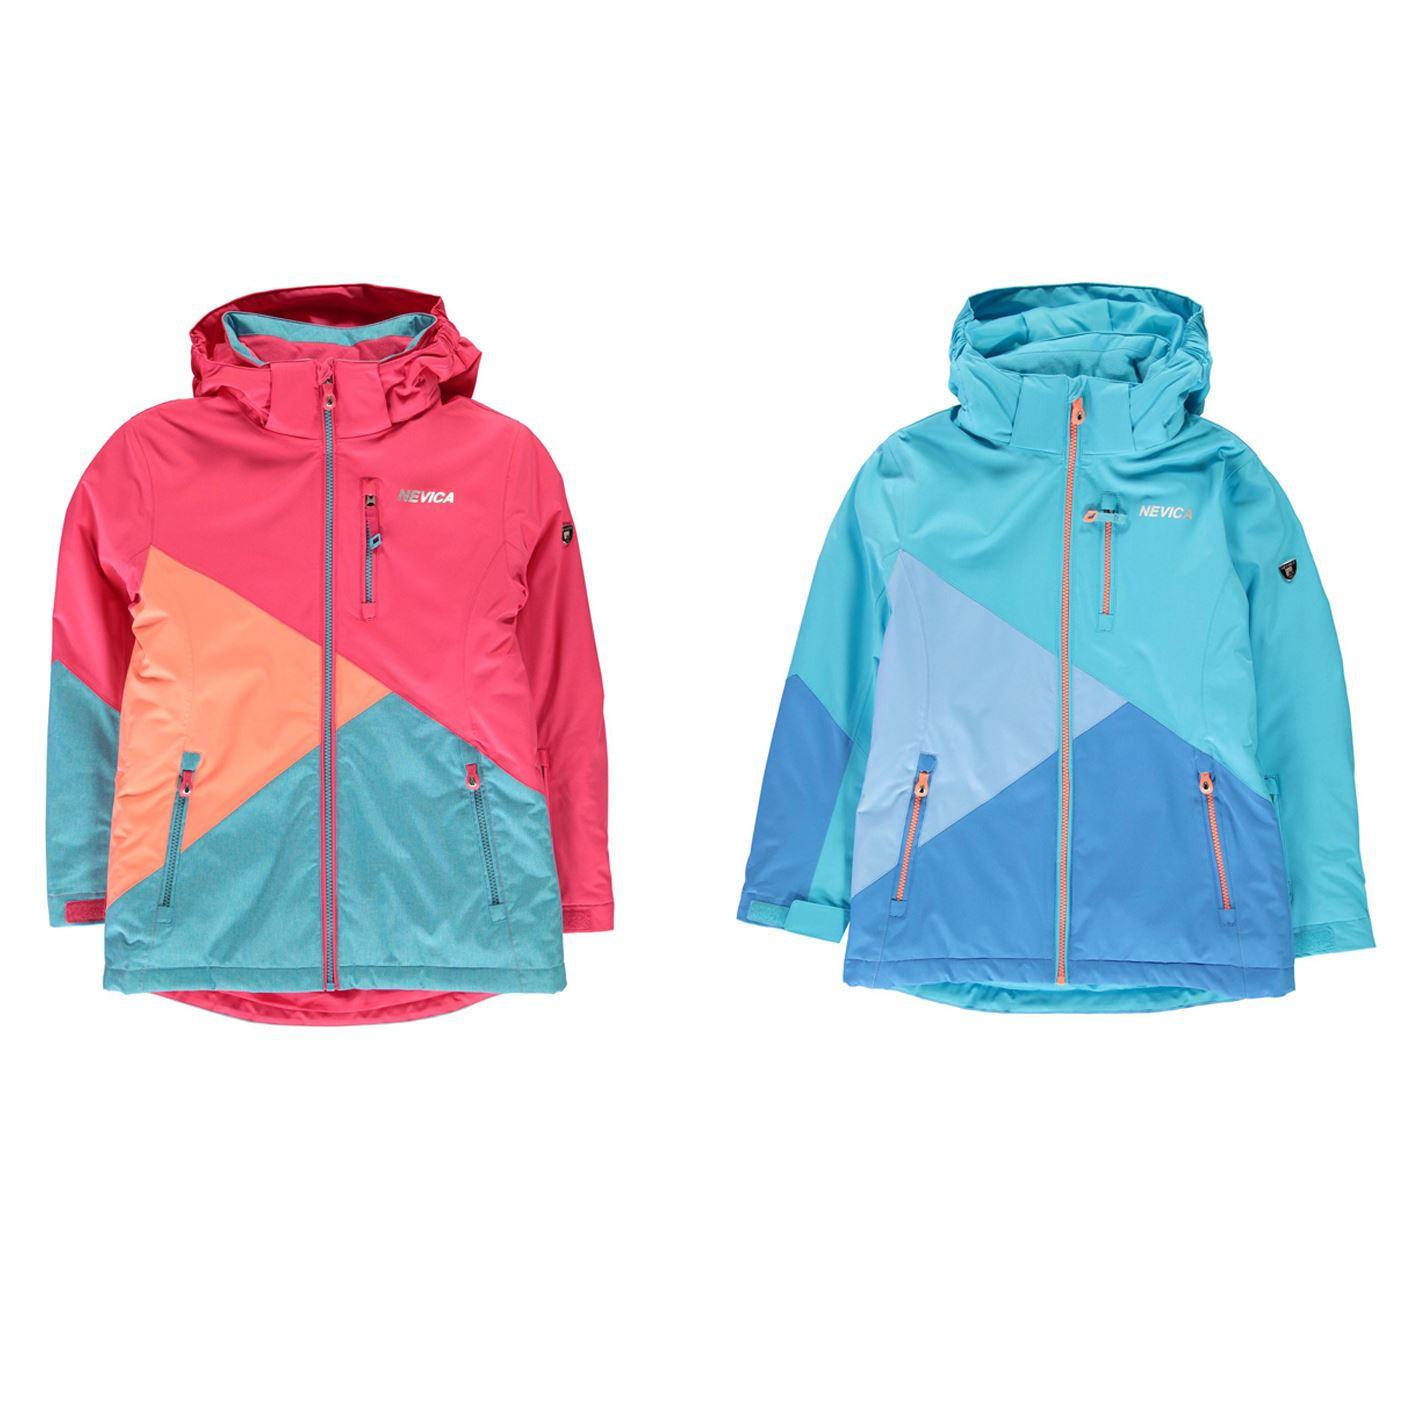 479e8d4c5 Nevica Meribel Ski Jacket Junior Girls Snow Coat Skiing Outerwear